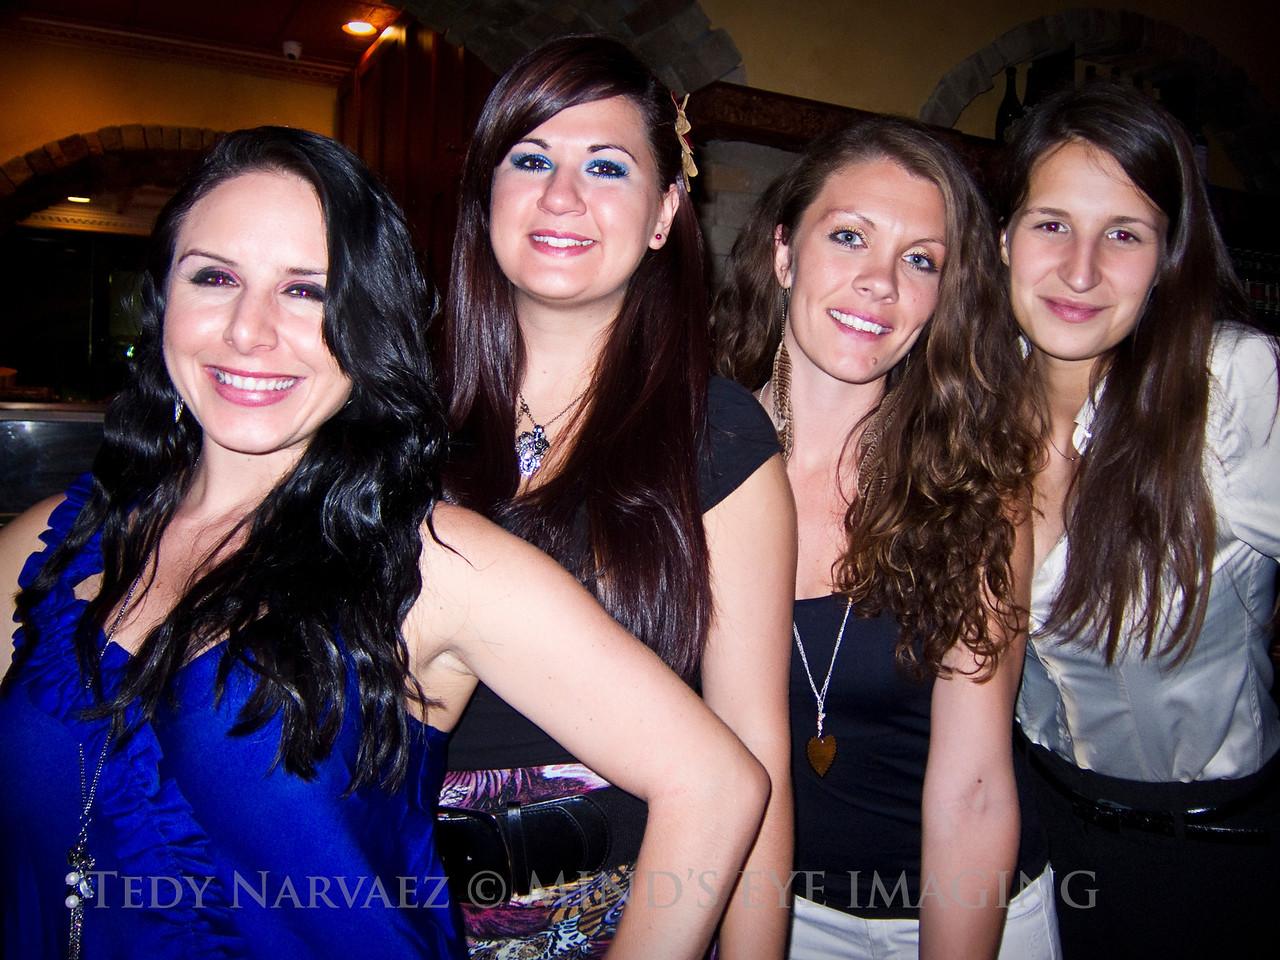 Ashley, Jenn, Ravenflower